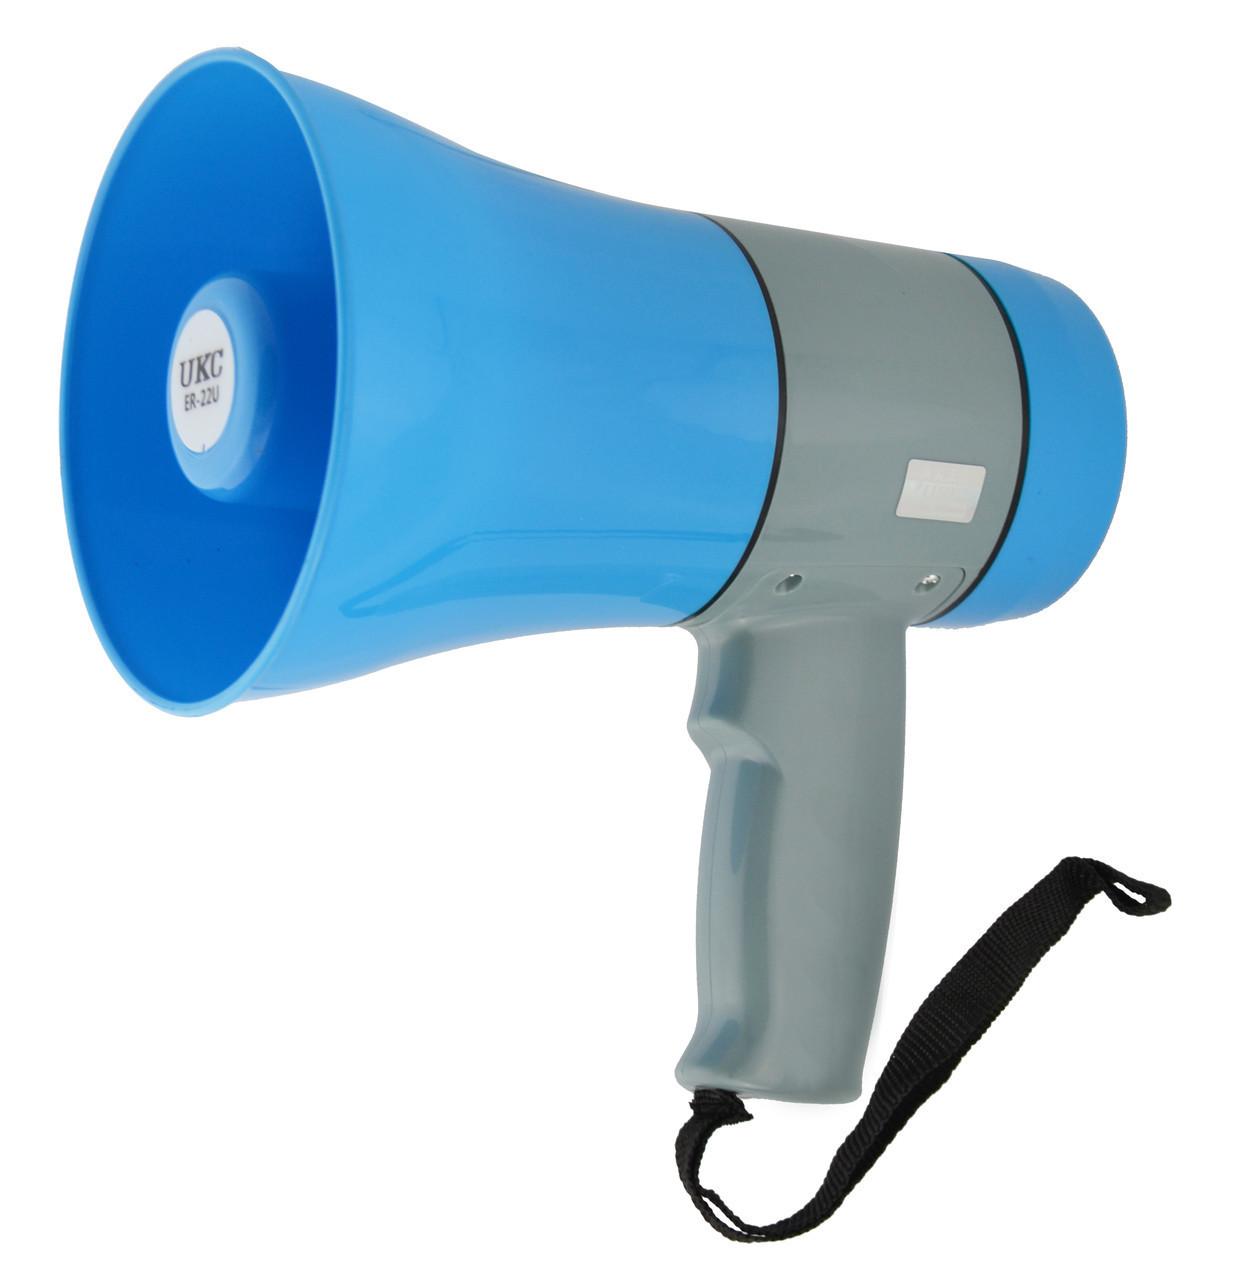 Громкоговоритель рупор UKC Мегафон 15Вт Ручний гучномовець